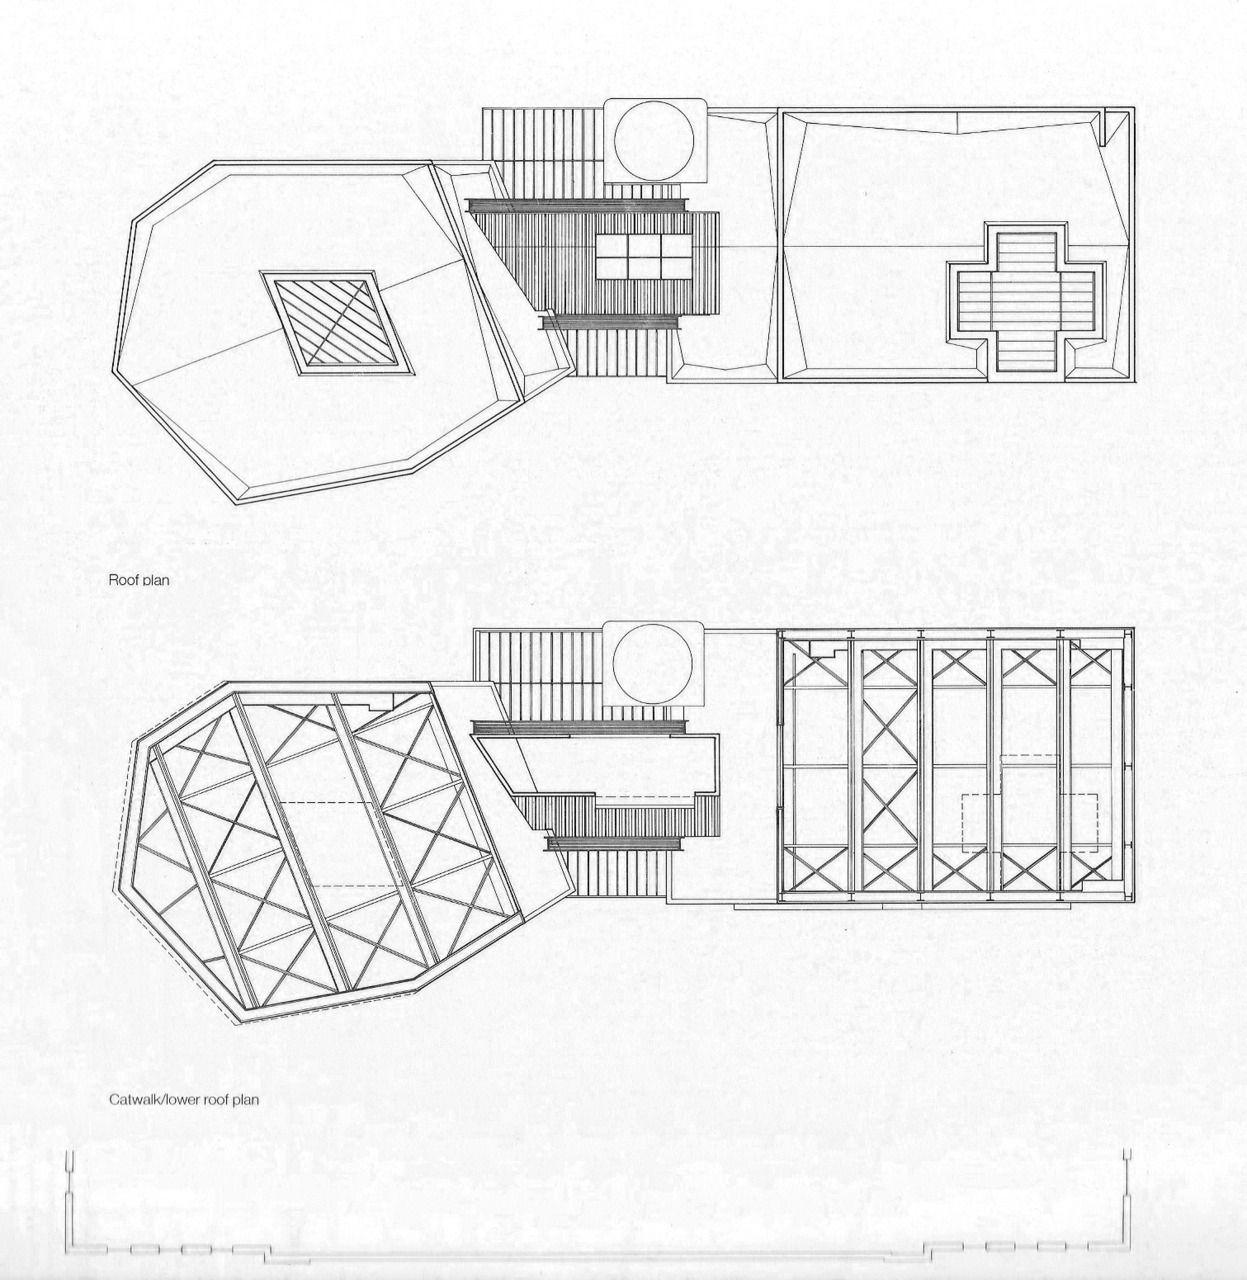 Frank O. Gehry California Aerospace Museum Roof plan